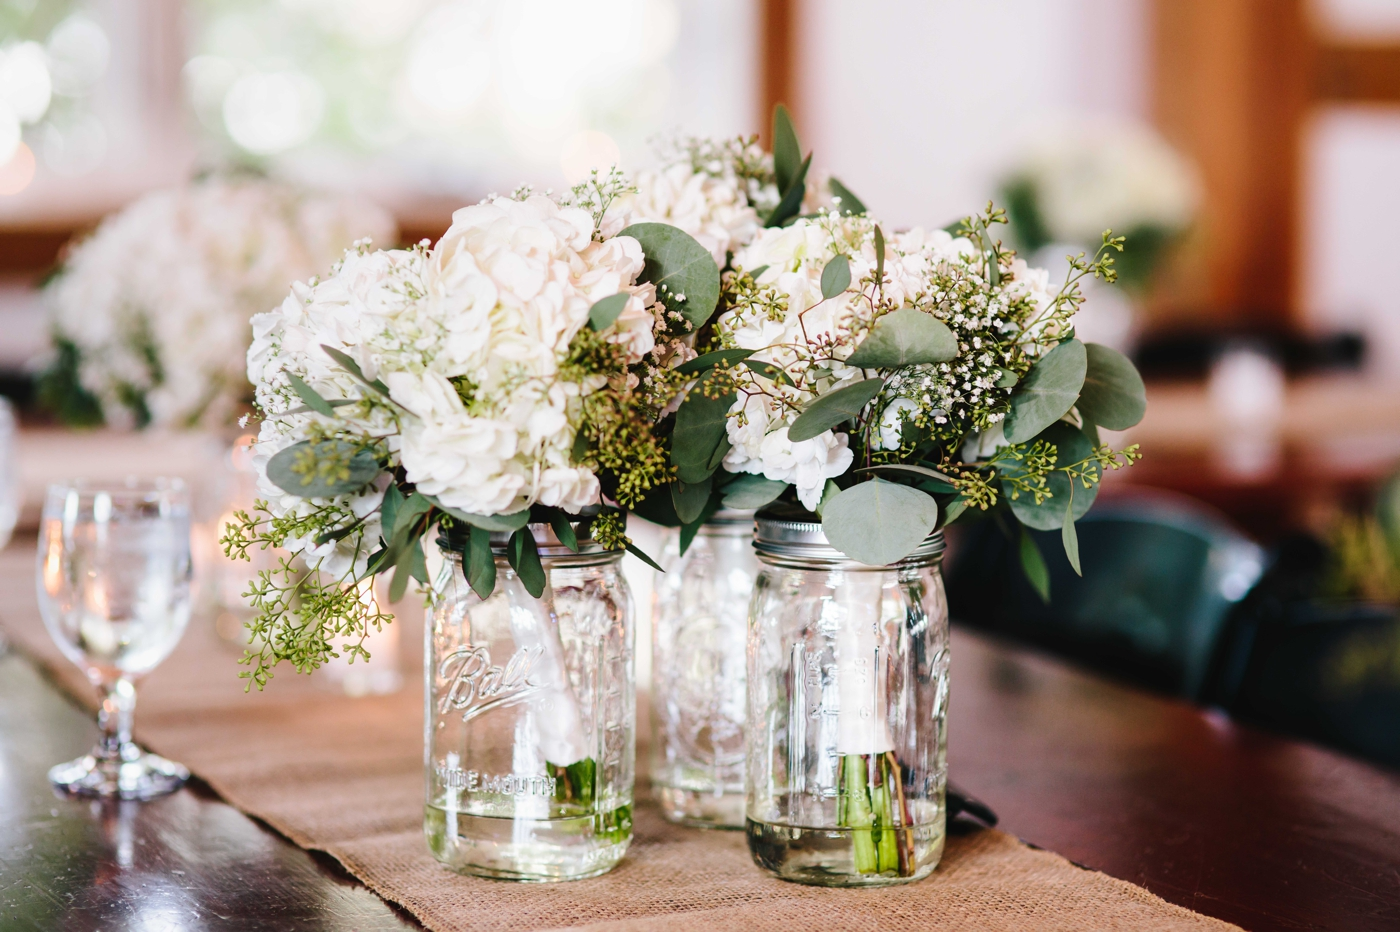 chicago-fine-art-wedding-photography-chiapetta41